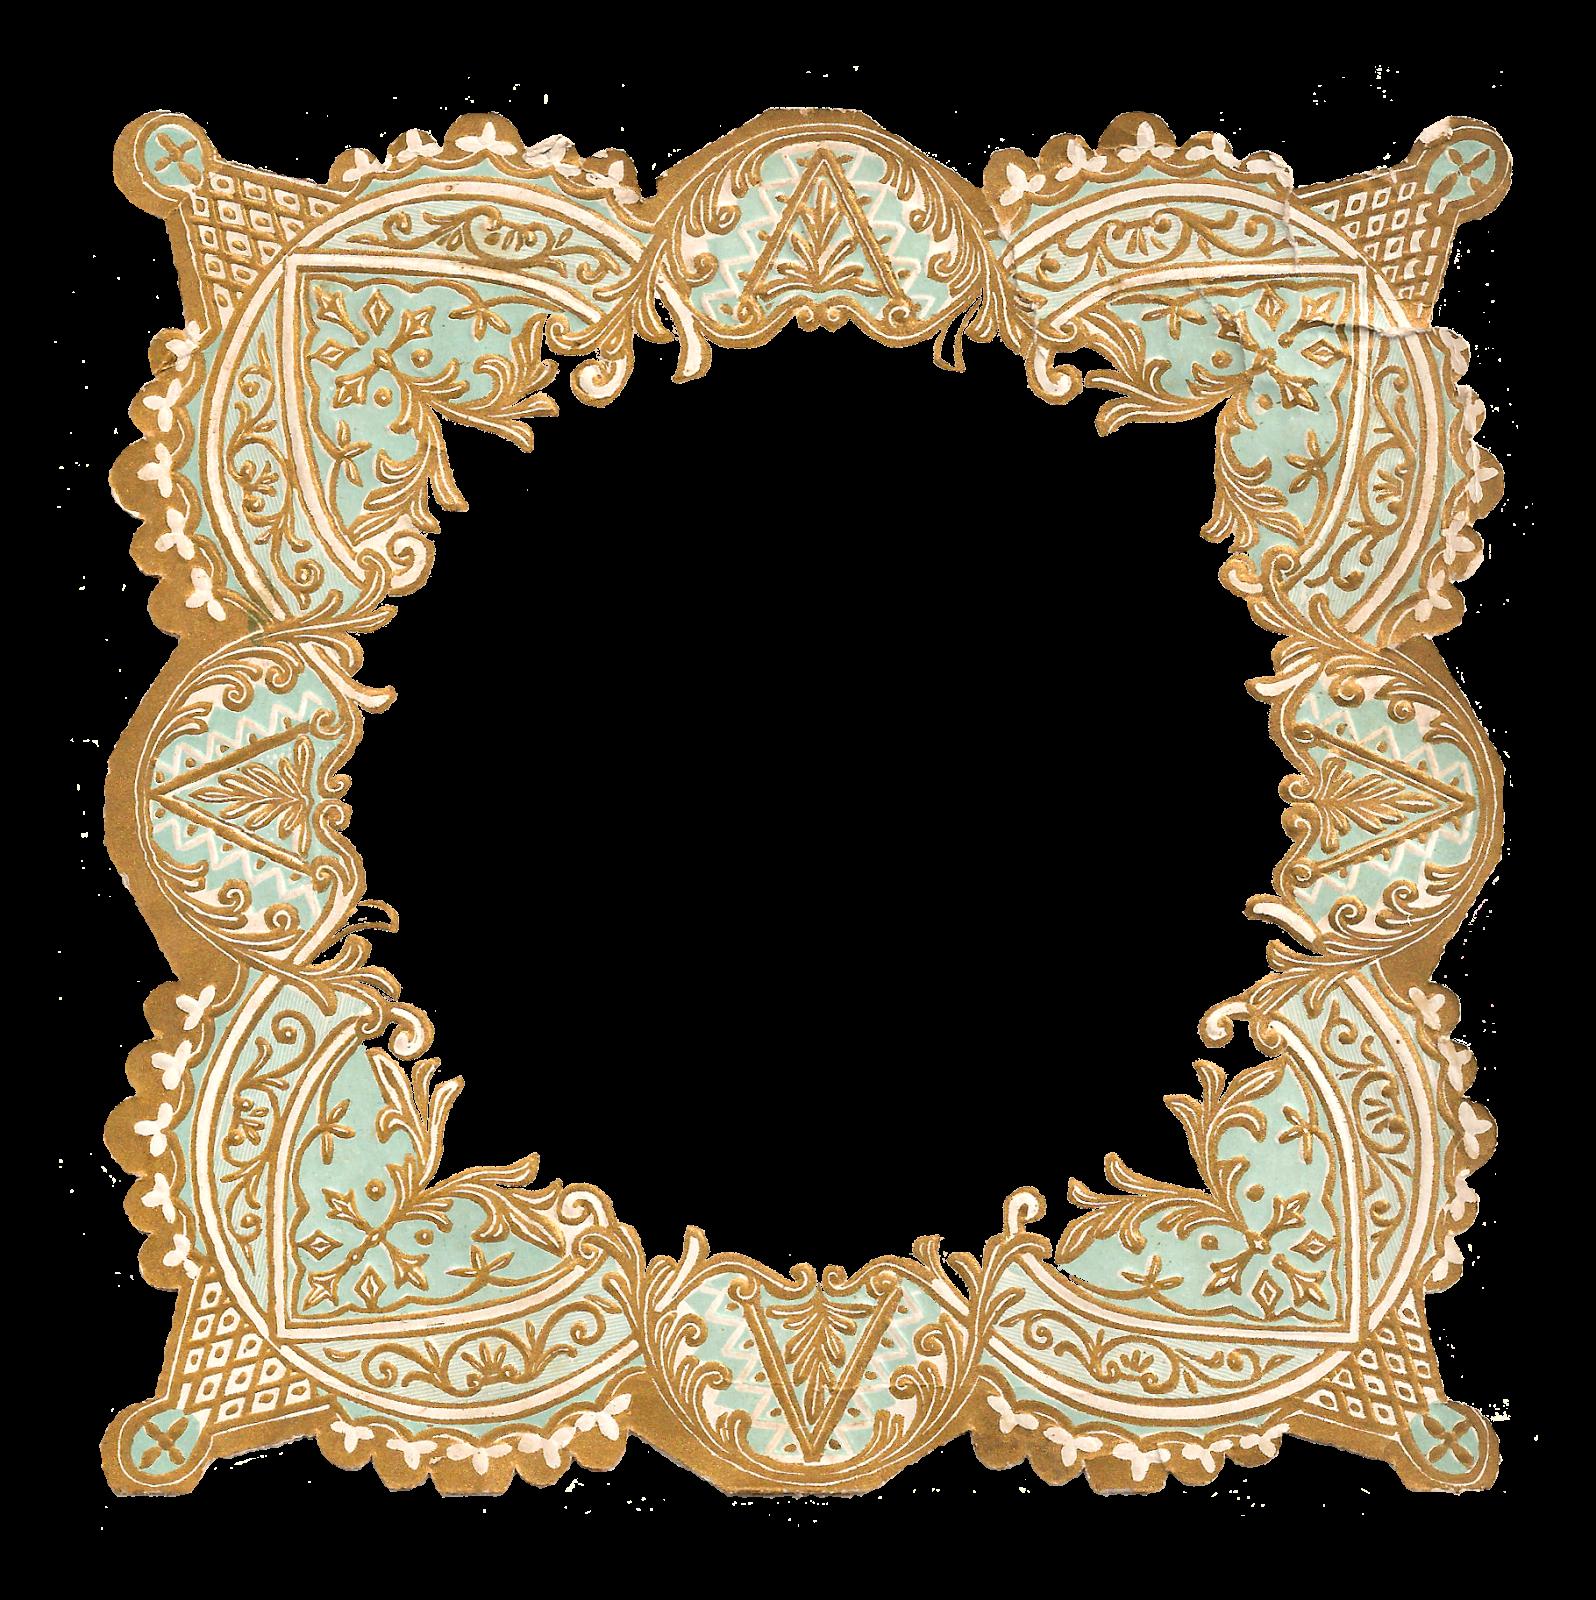 The Graphics Monarch: Digital Craft Supply Frame Border Decorative ...